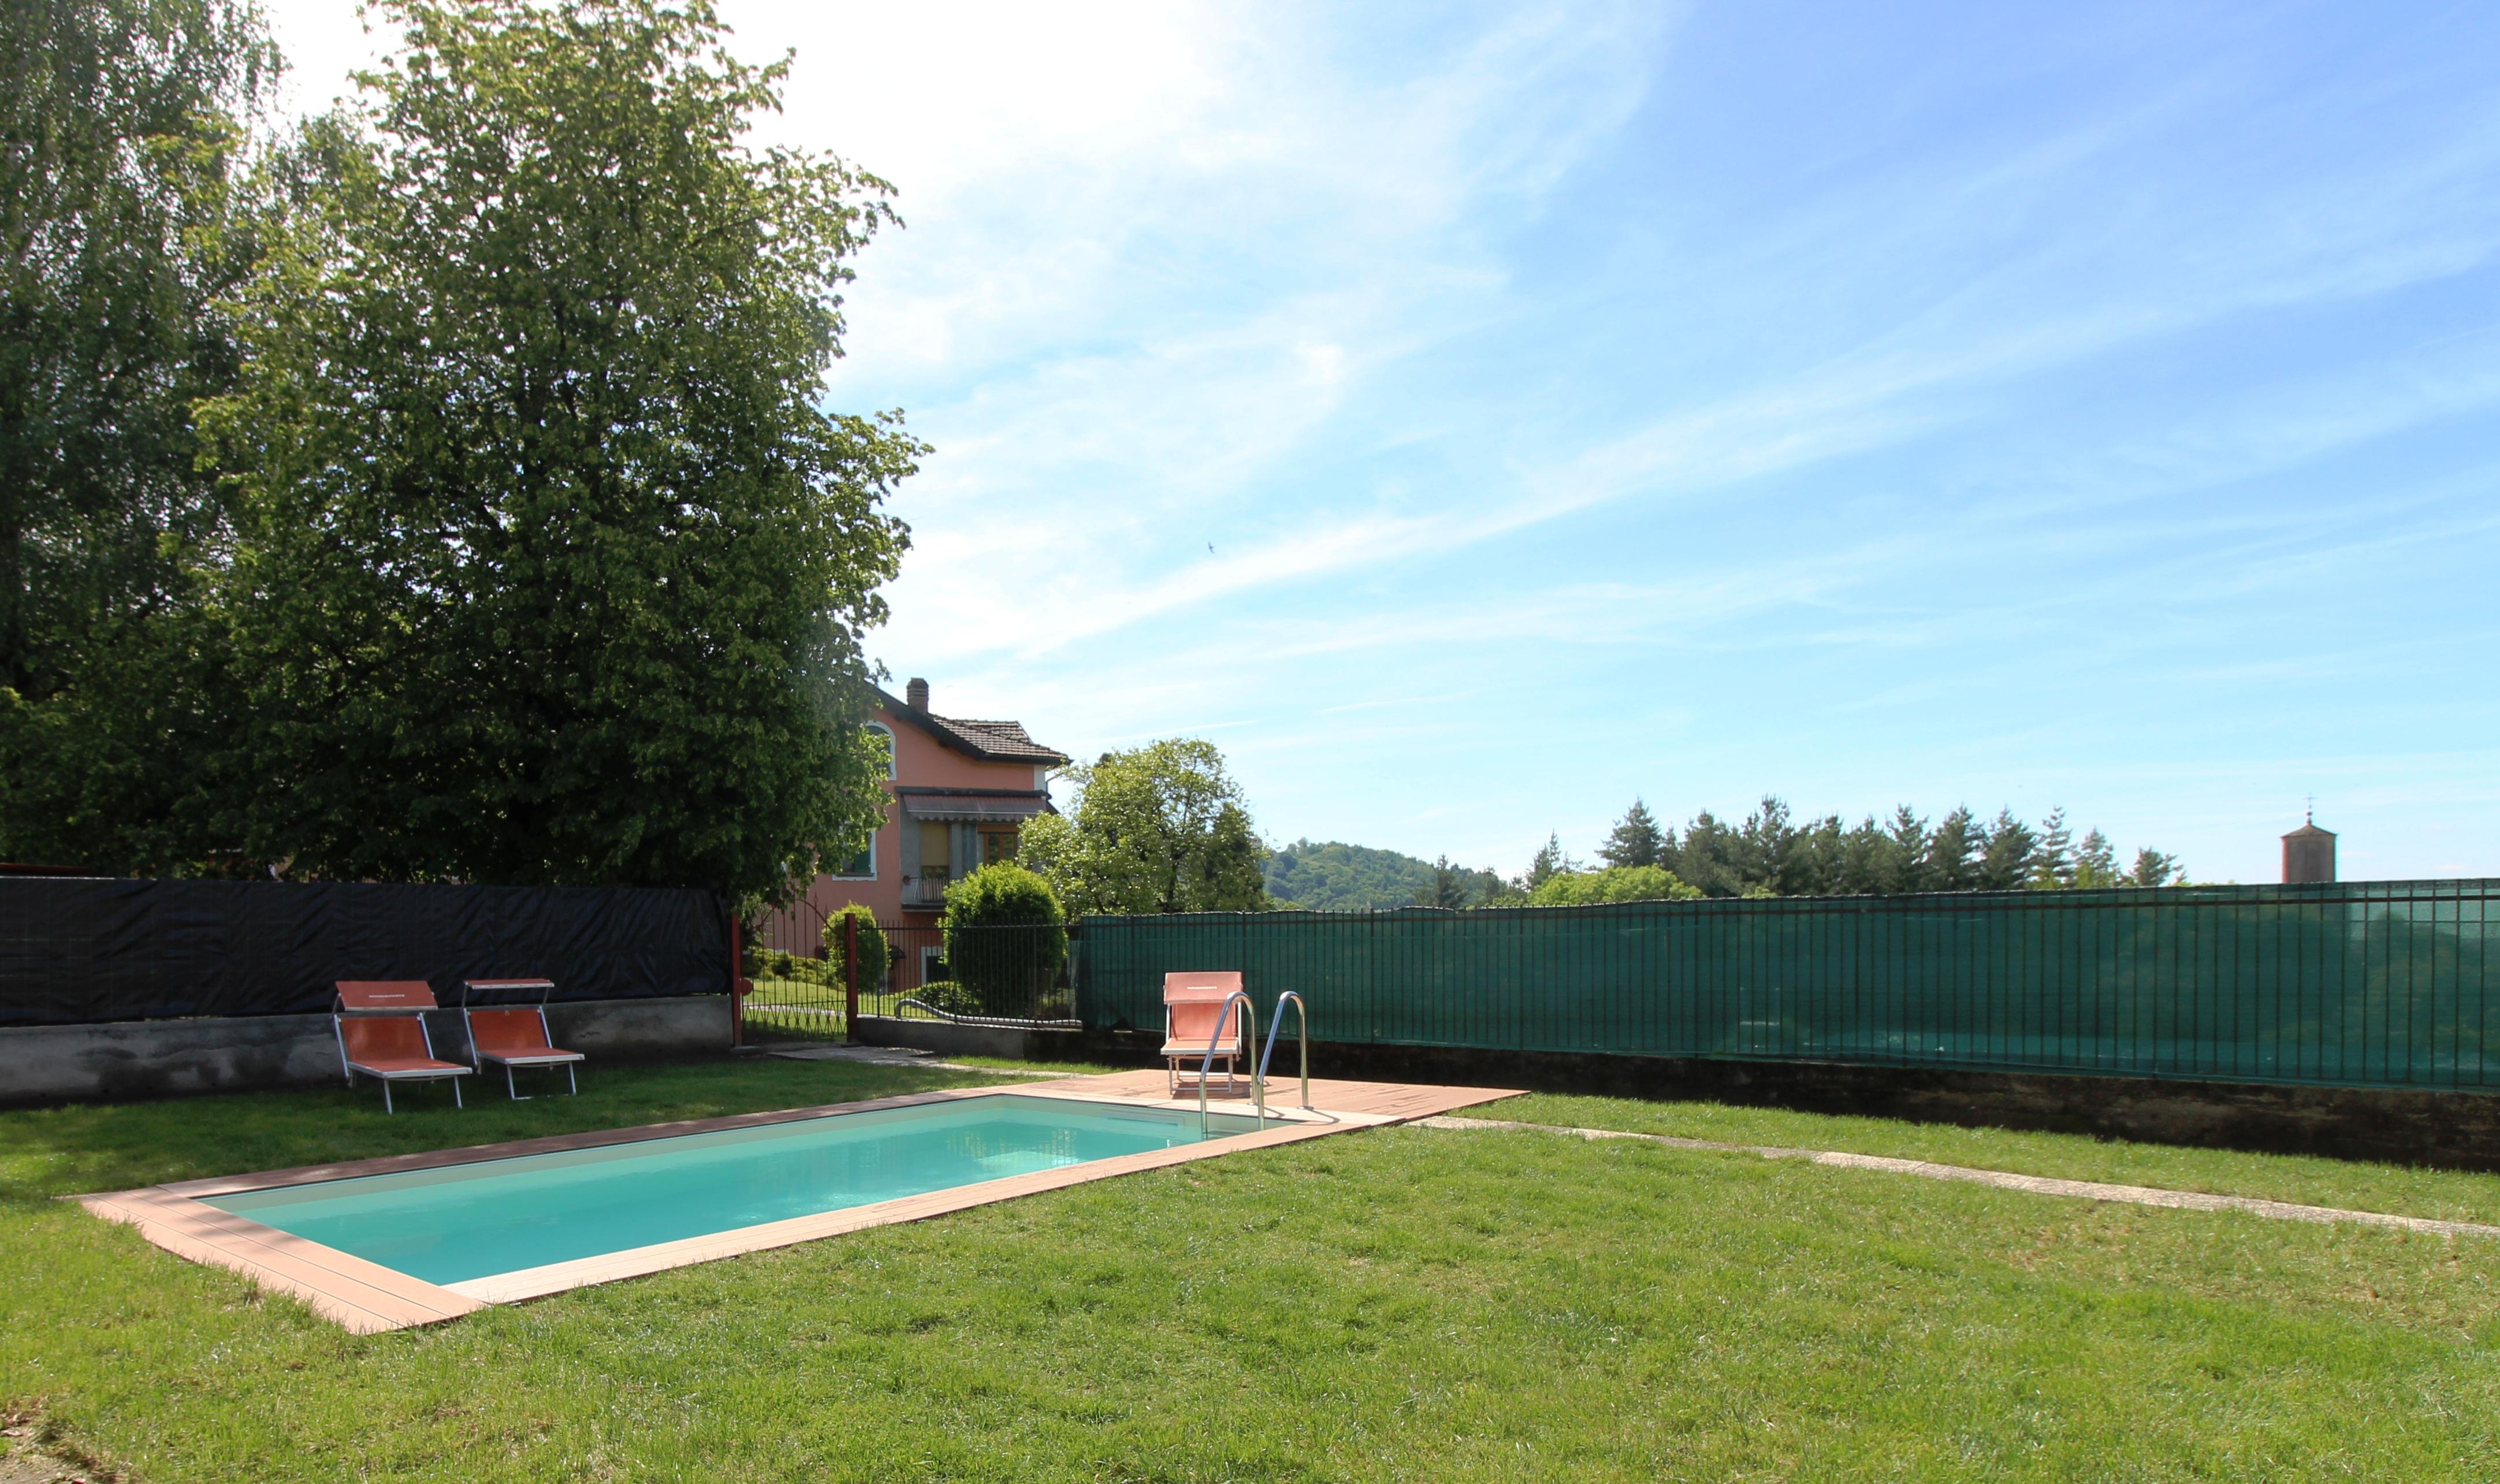 Piscine All Aperto Piemonte vacation rentals, homes, experiences & places - airbnb